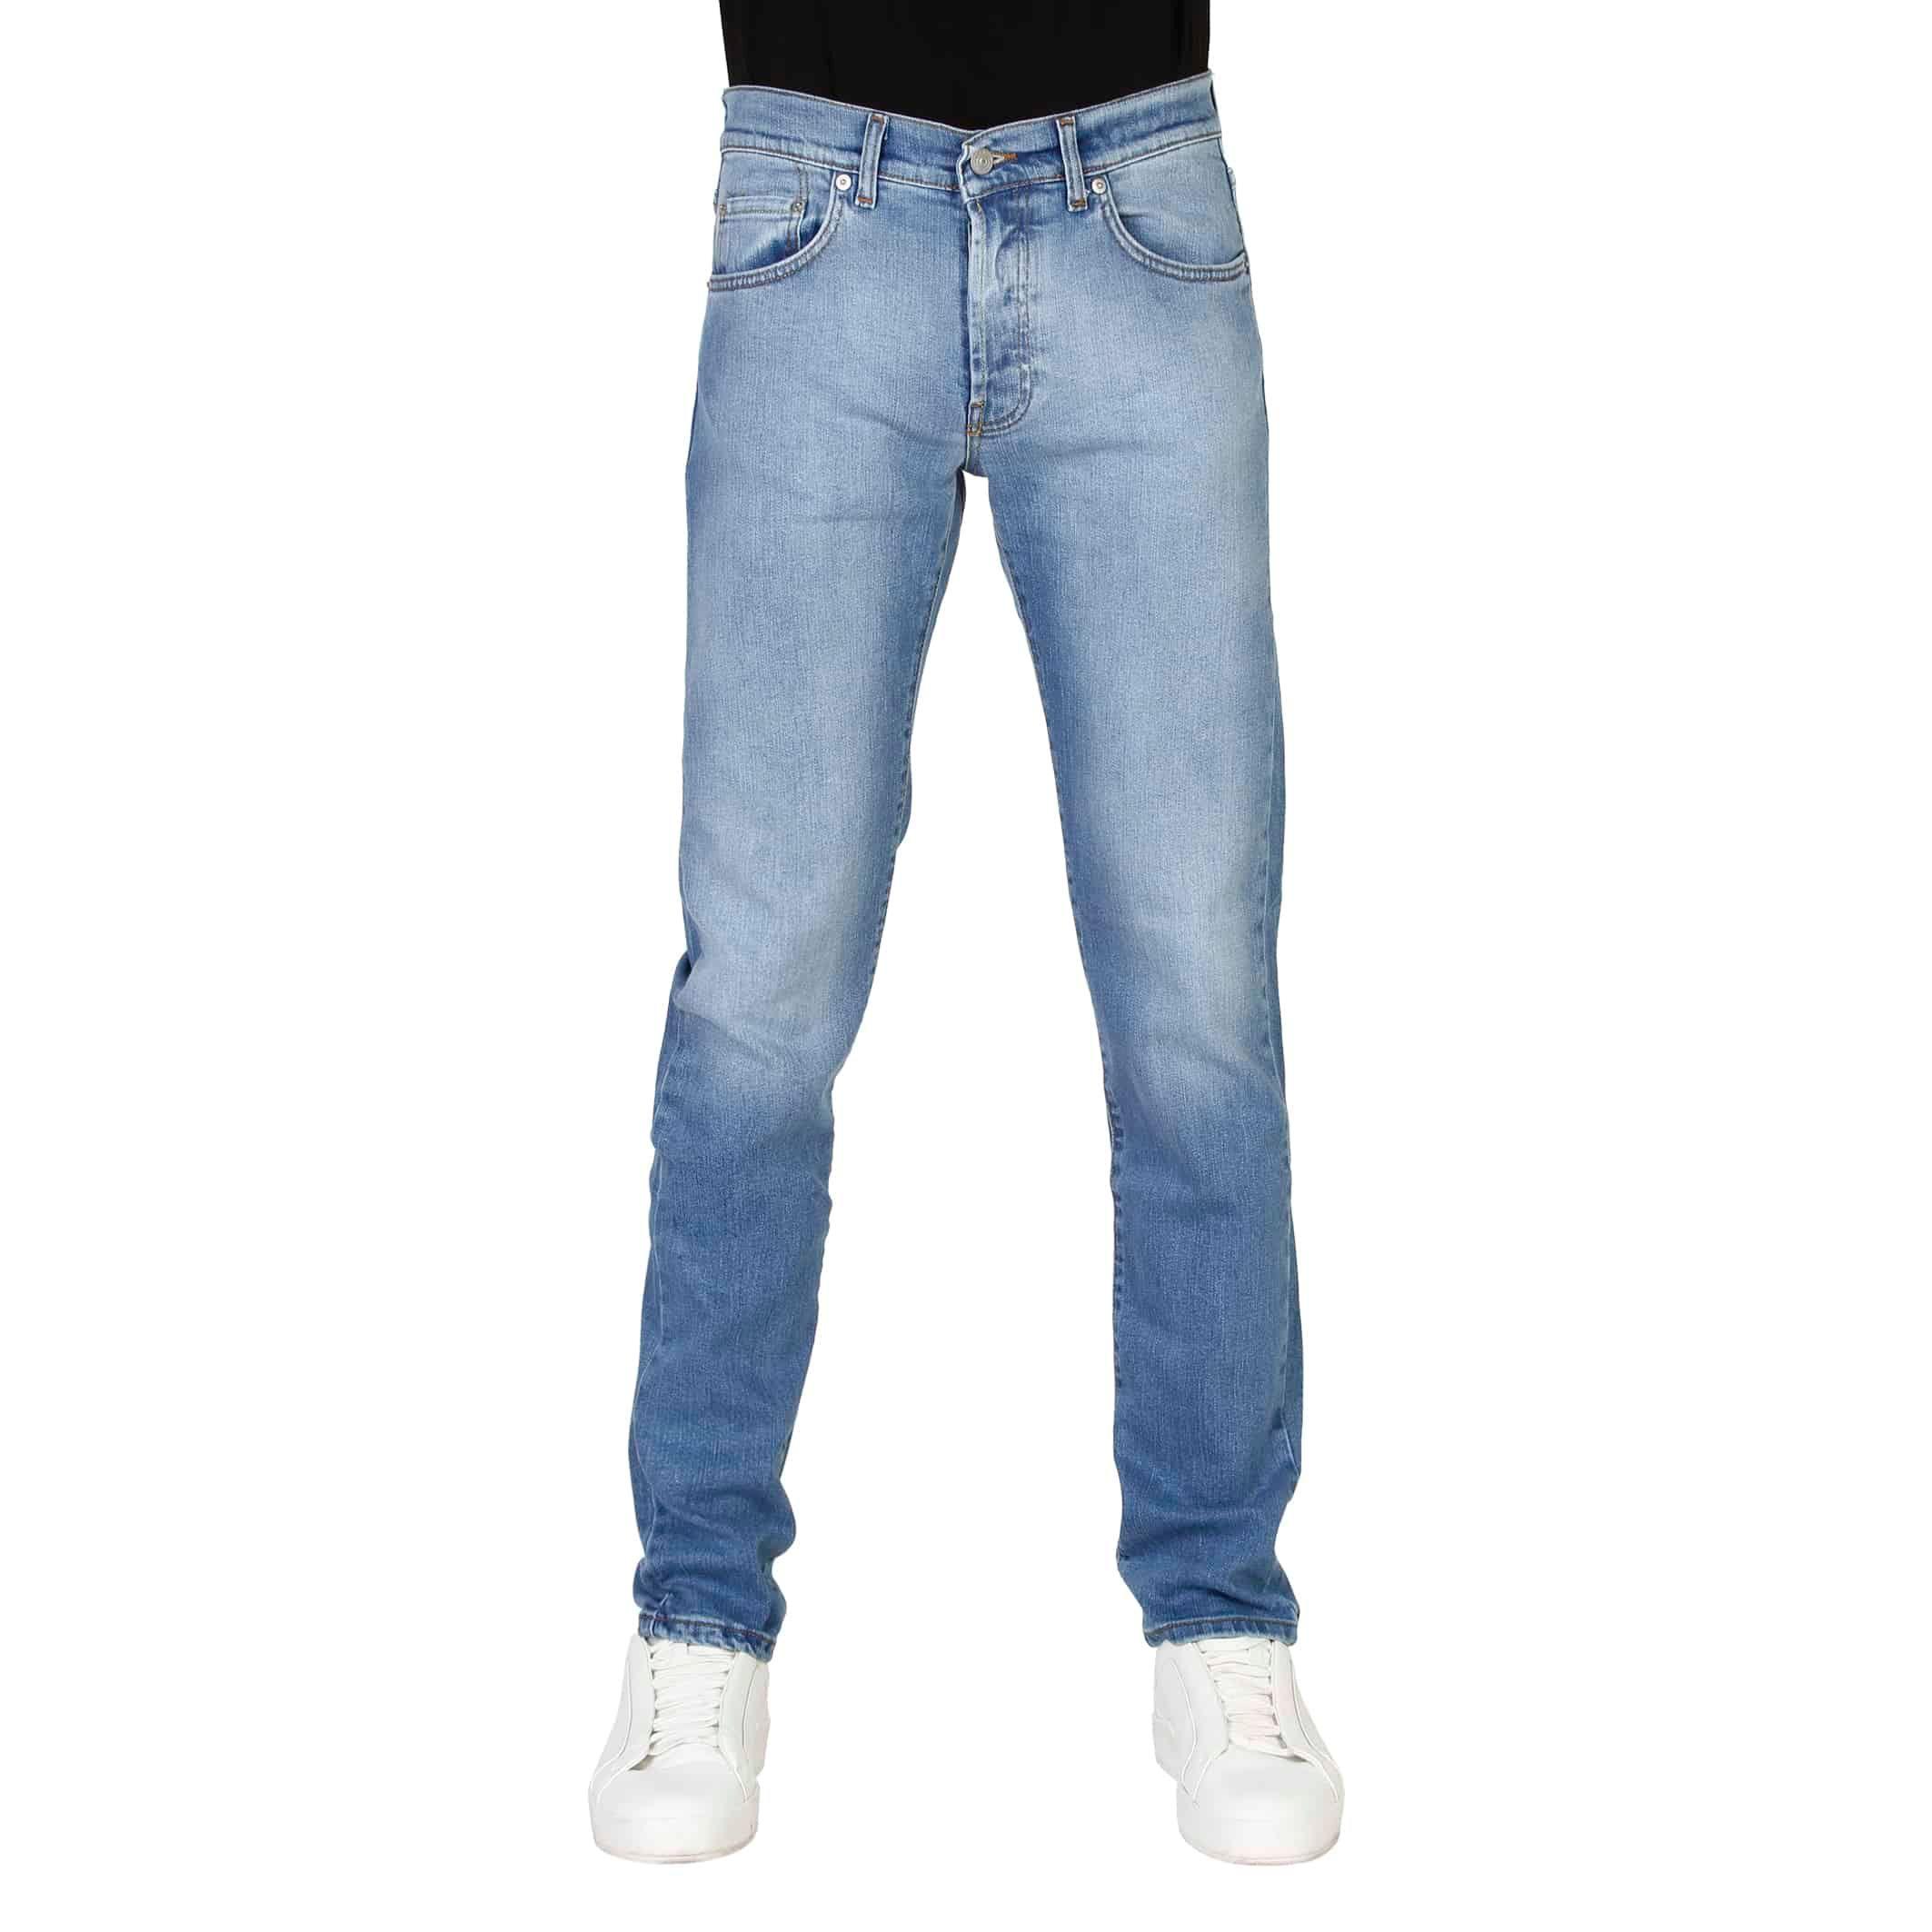 Carrera Jeans – 000710_0970A